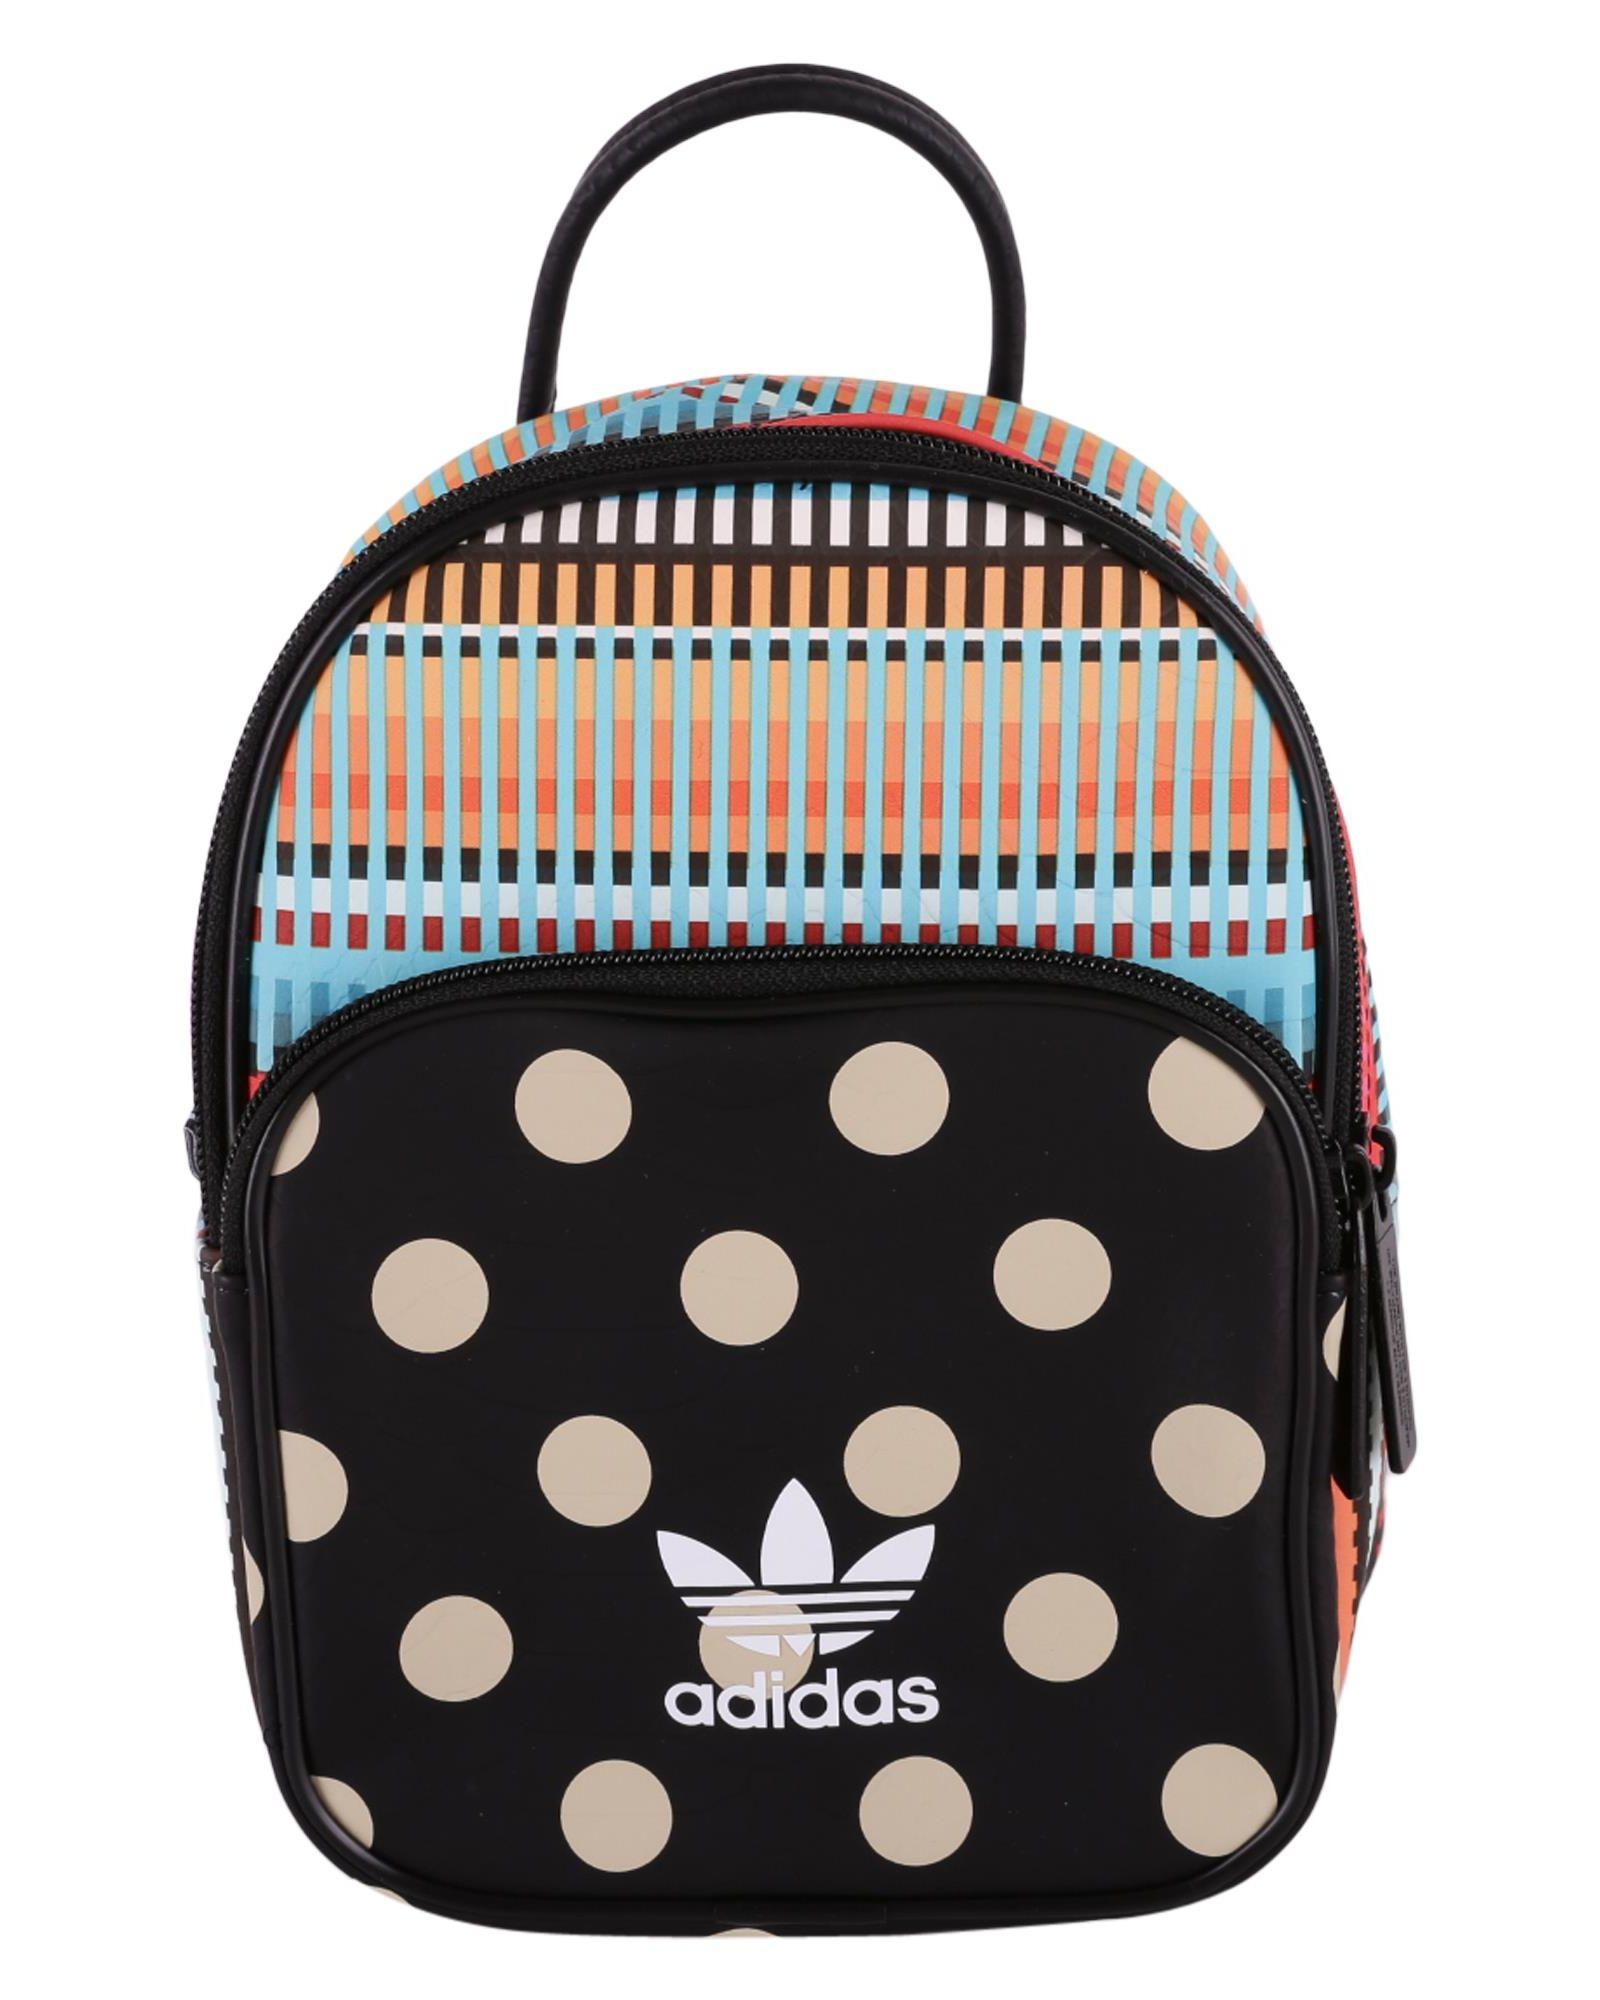 Adidas Originals Mini Backpack In Multicolor   ModeSens b7b99604a3